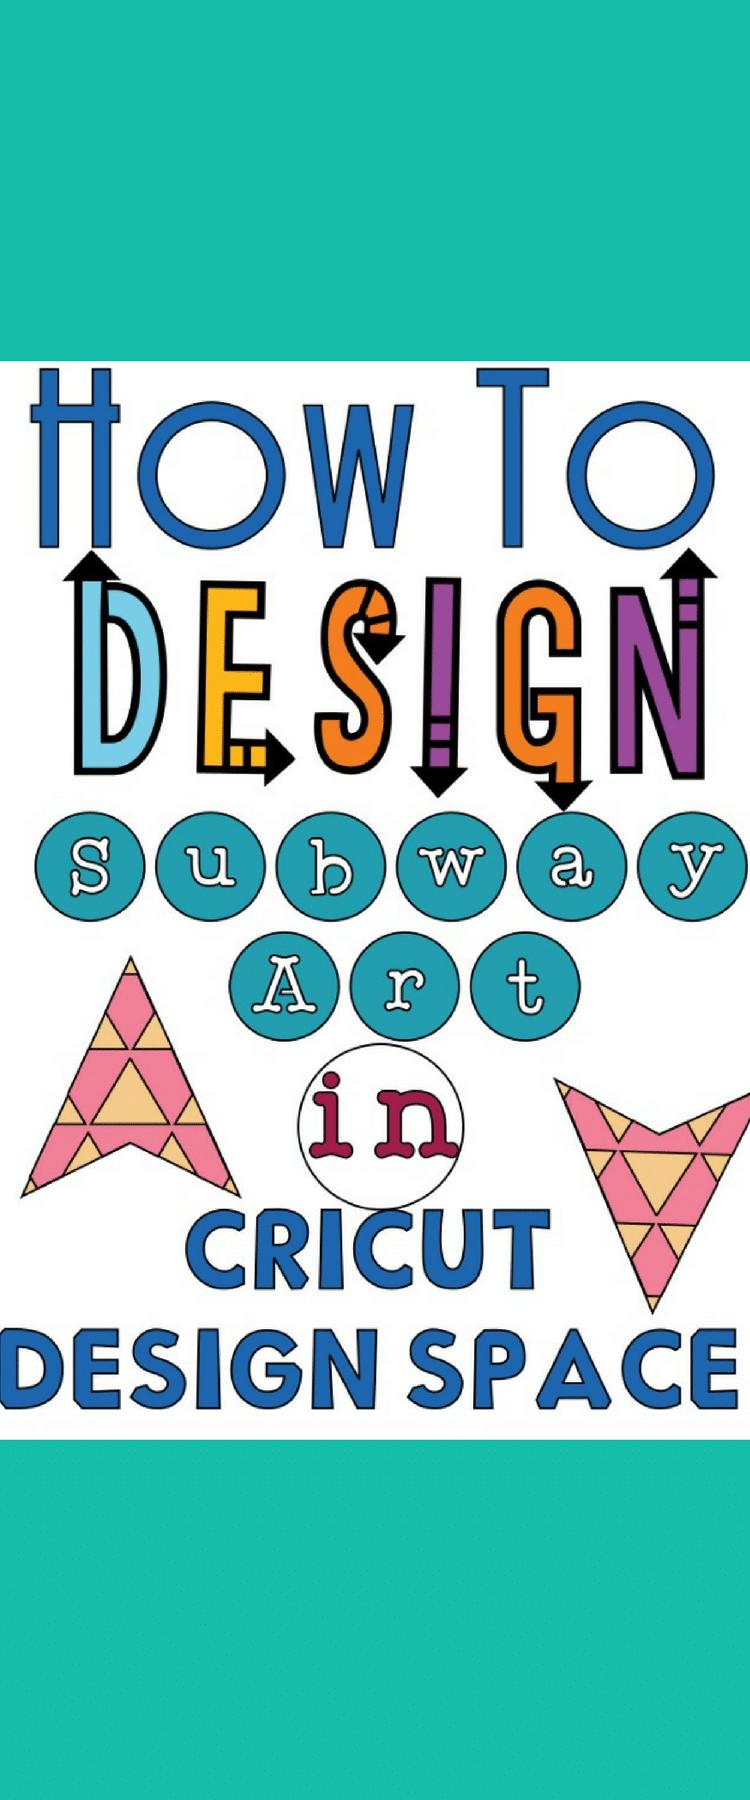 Subway Art / Cricut Design Space / Cricut Tutorial / Cricut Tips / Cricut Subway Art